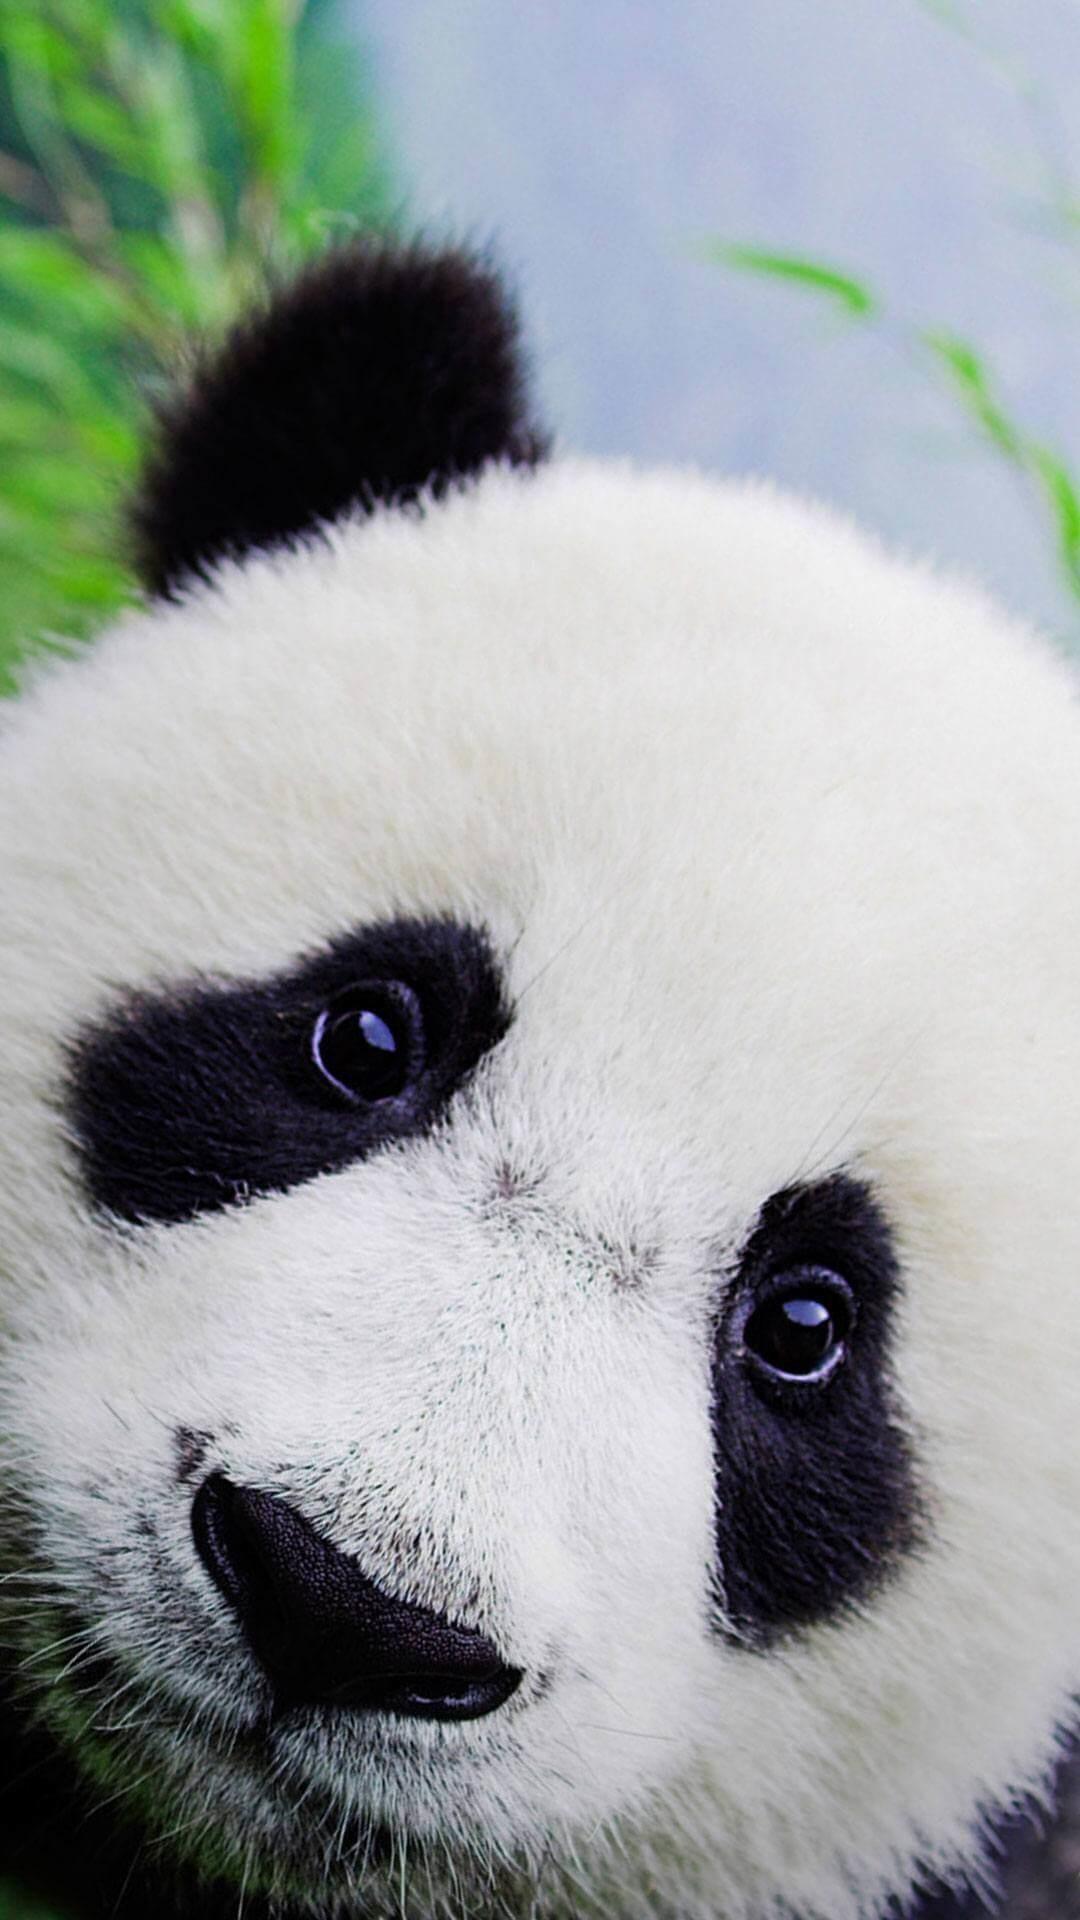 Res: 1080x1920, Cute Baby Panda Wallpaper For iPhone HD